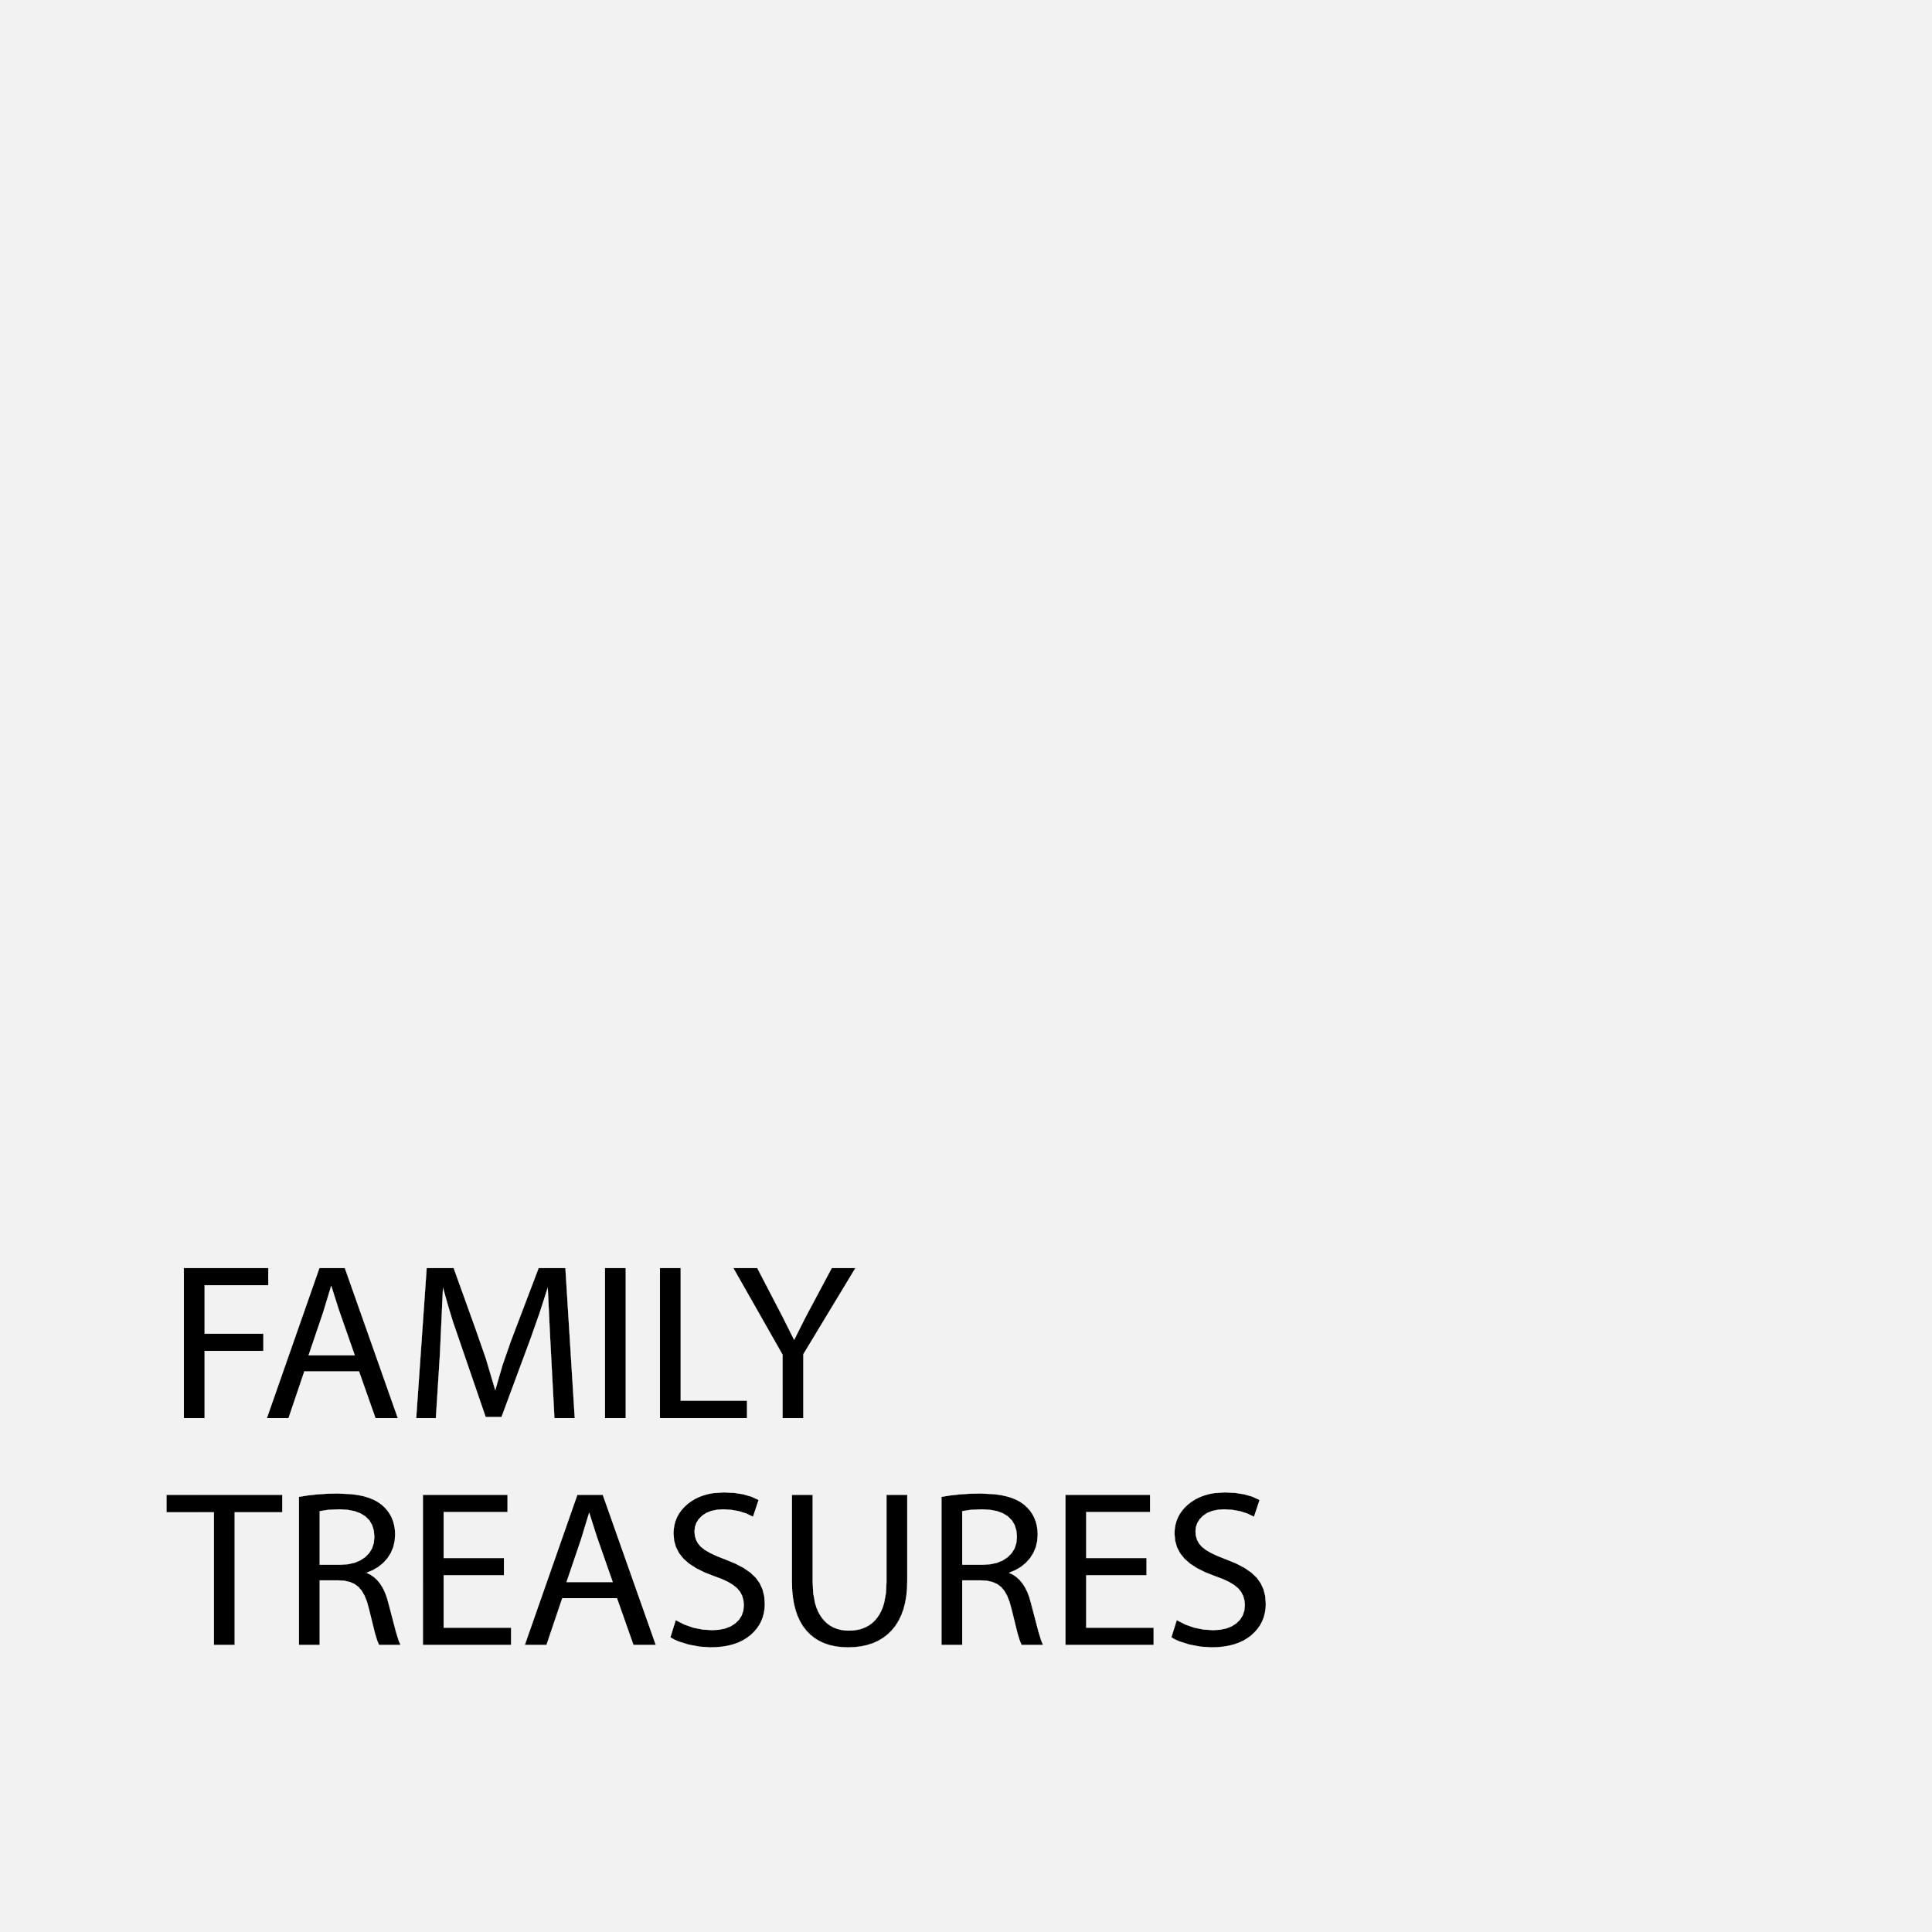 FamilyTreasure95Grey.jpg